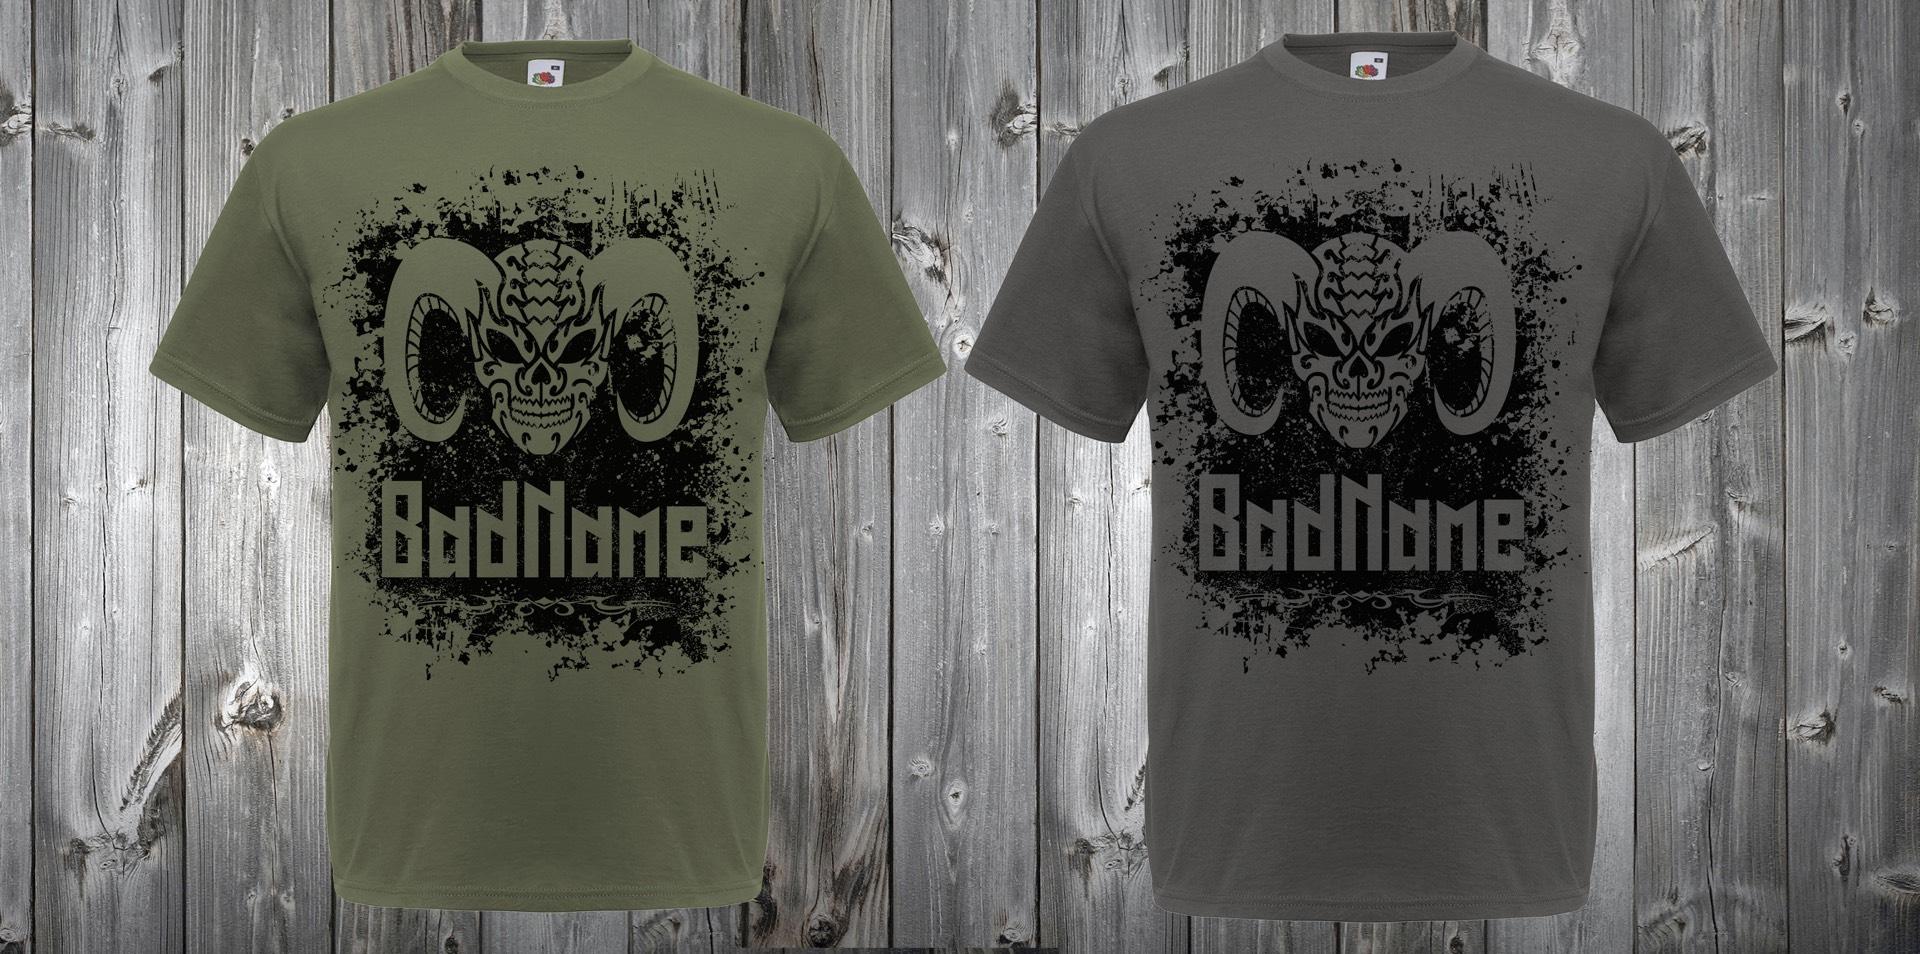 03. Merchandise